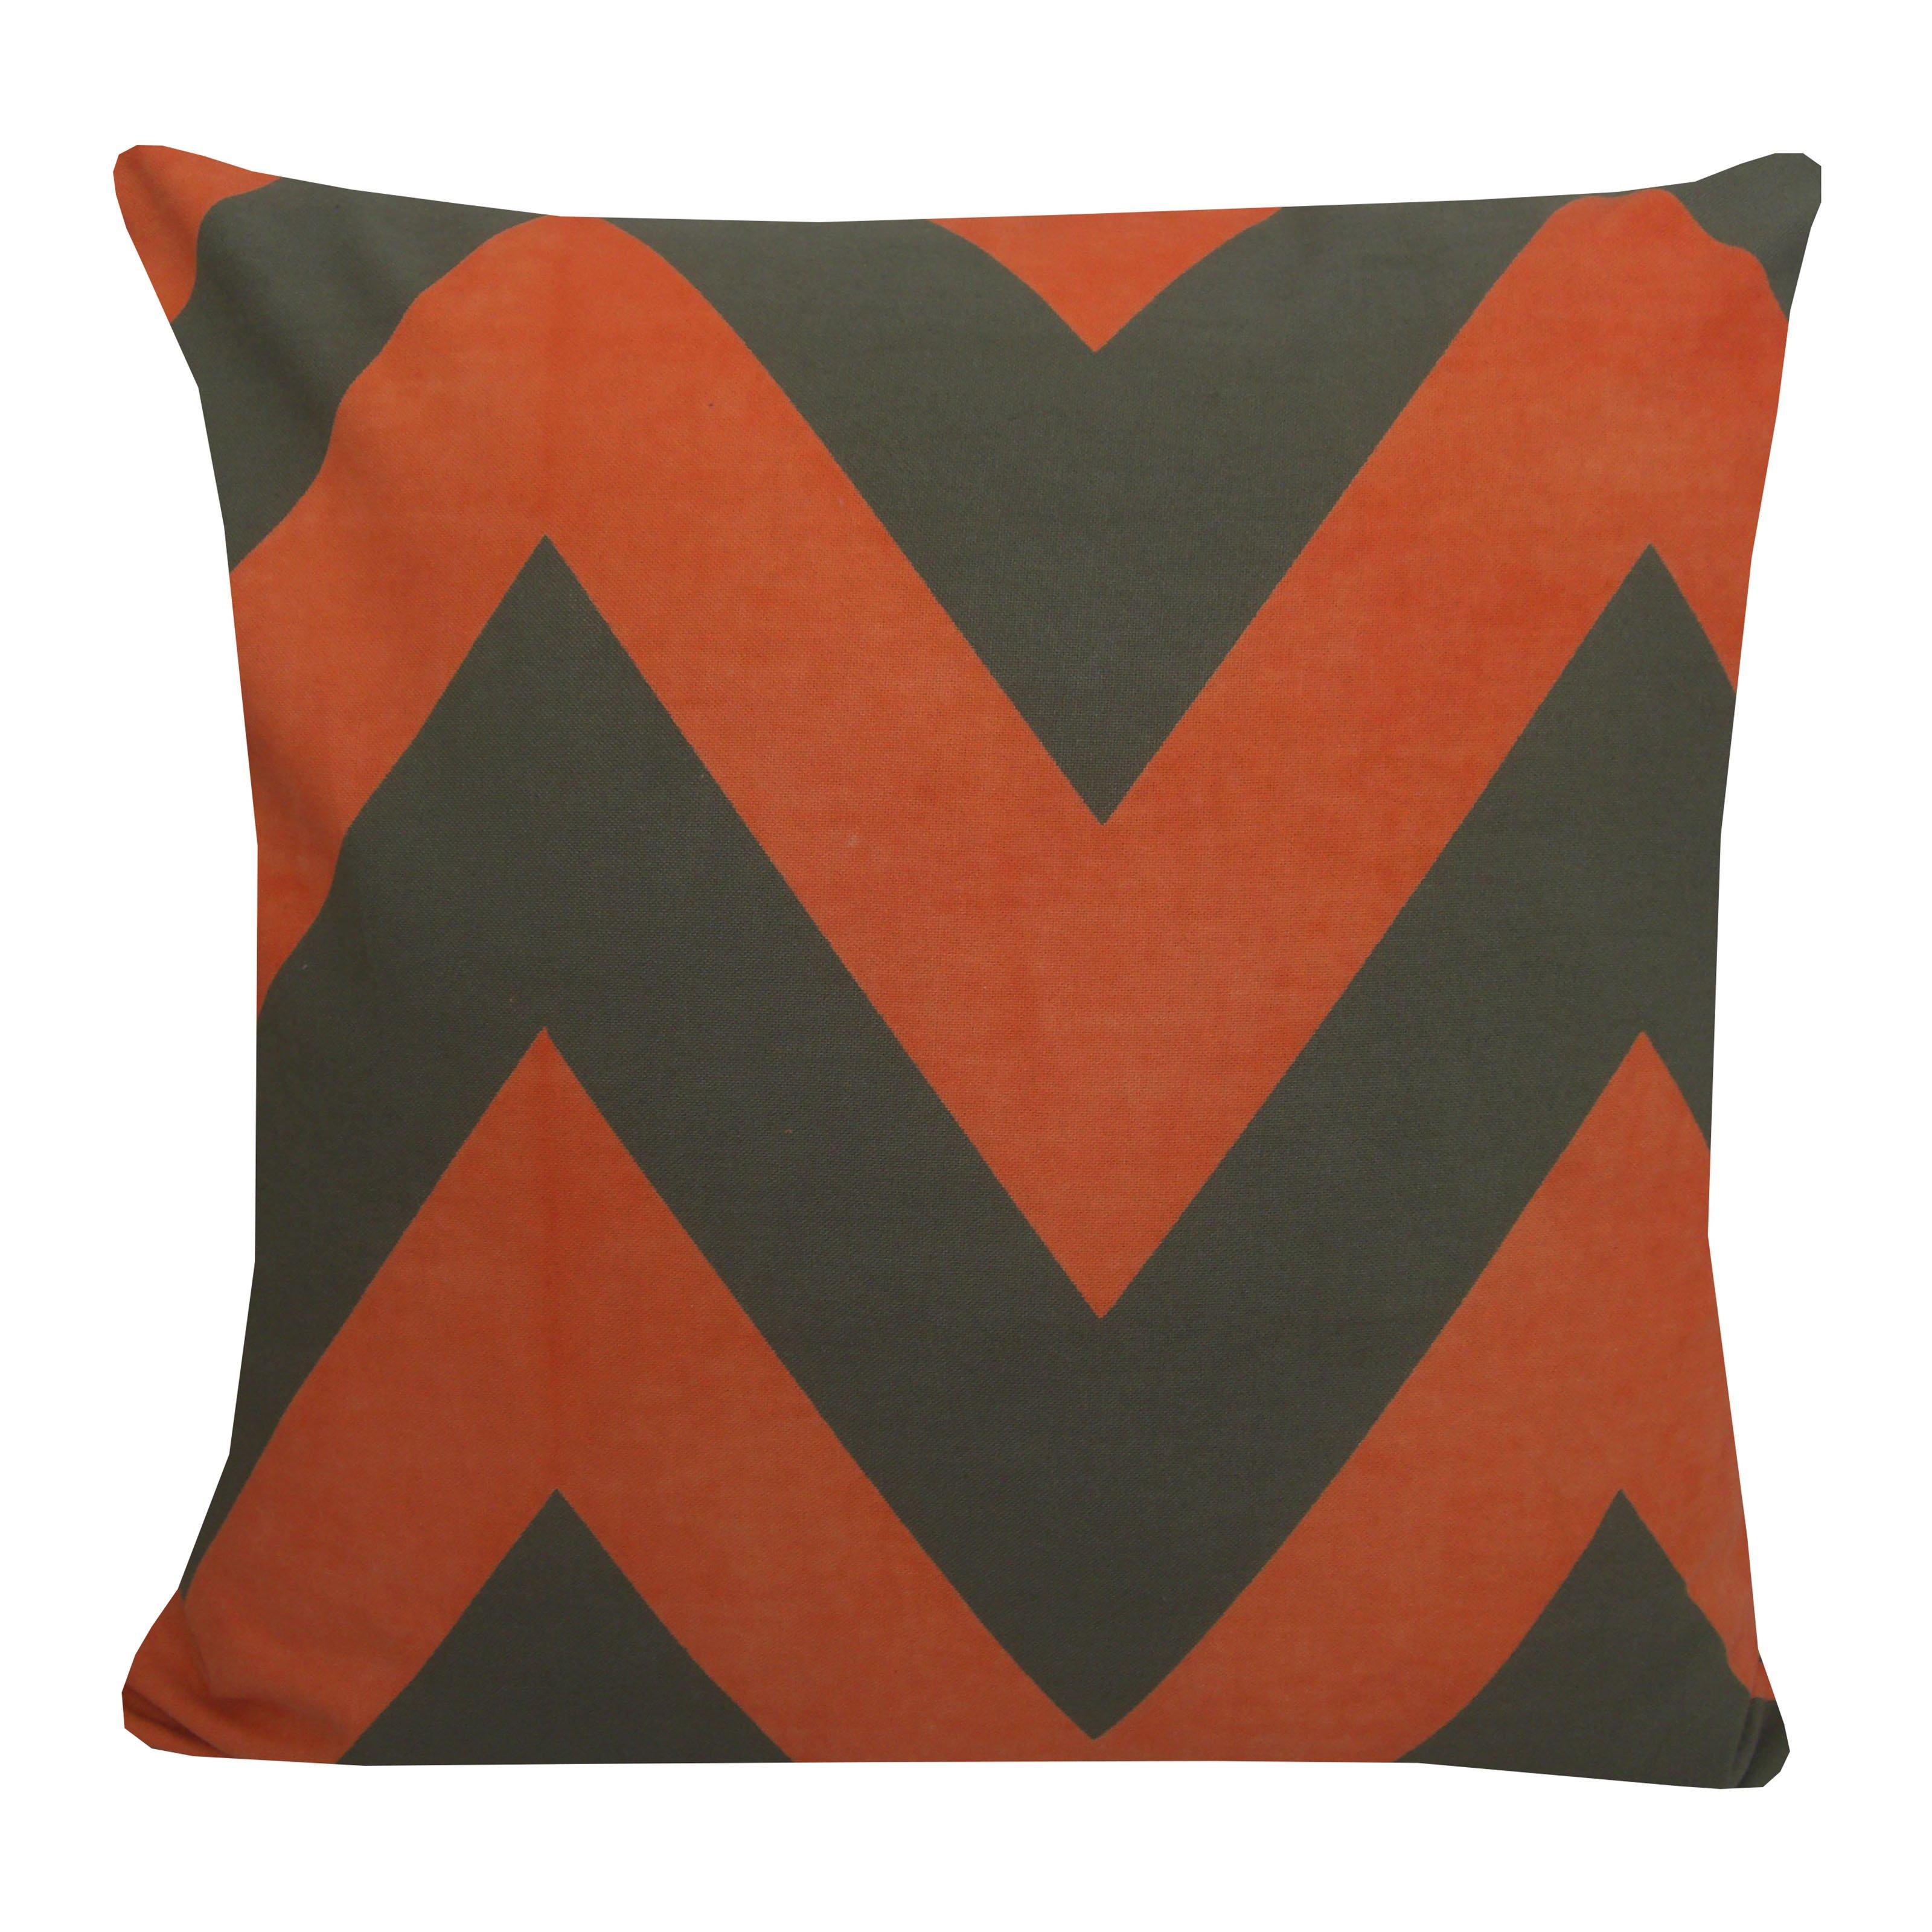 Divine Designs Wide Chevron Decorative Throw Pillow